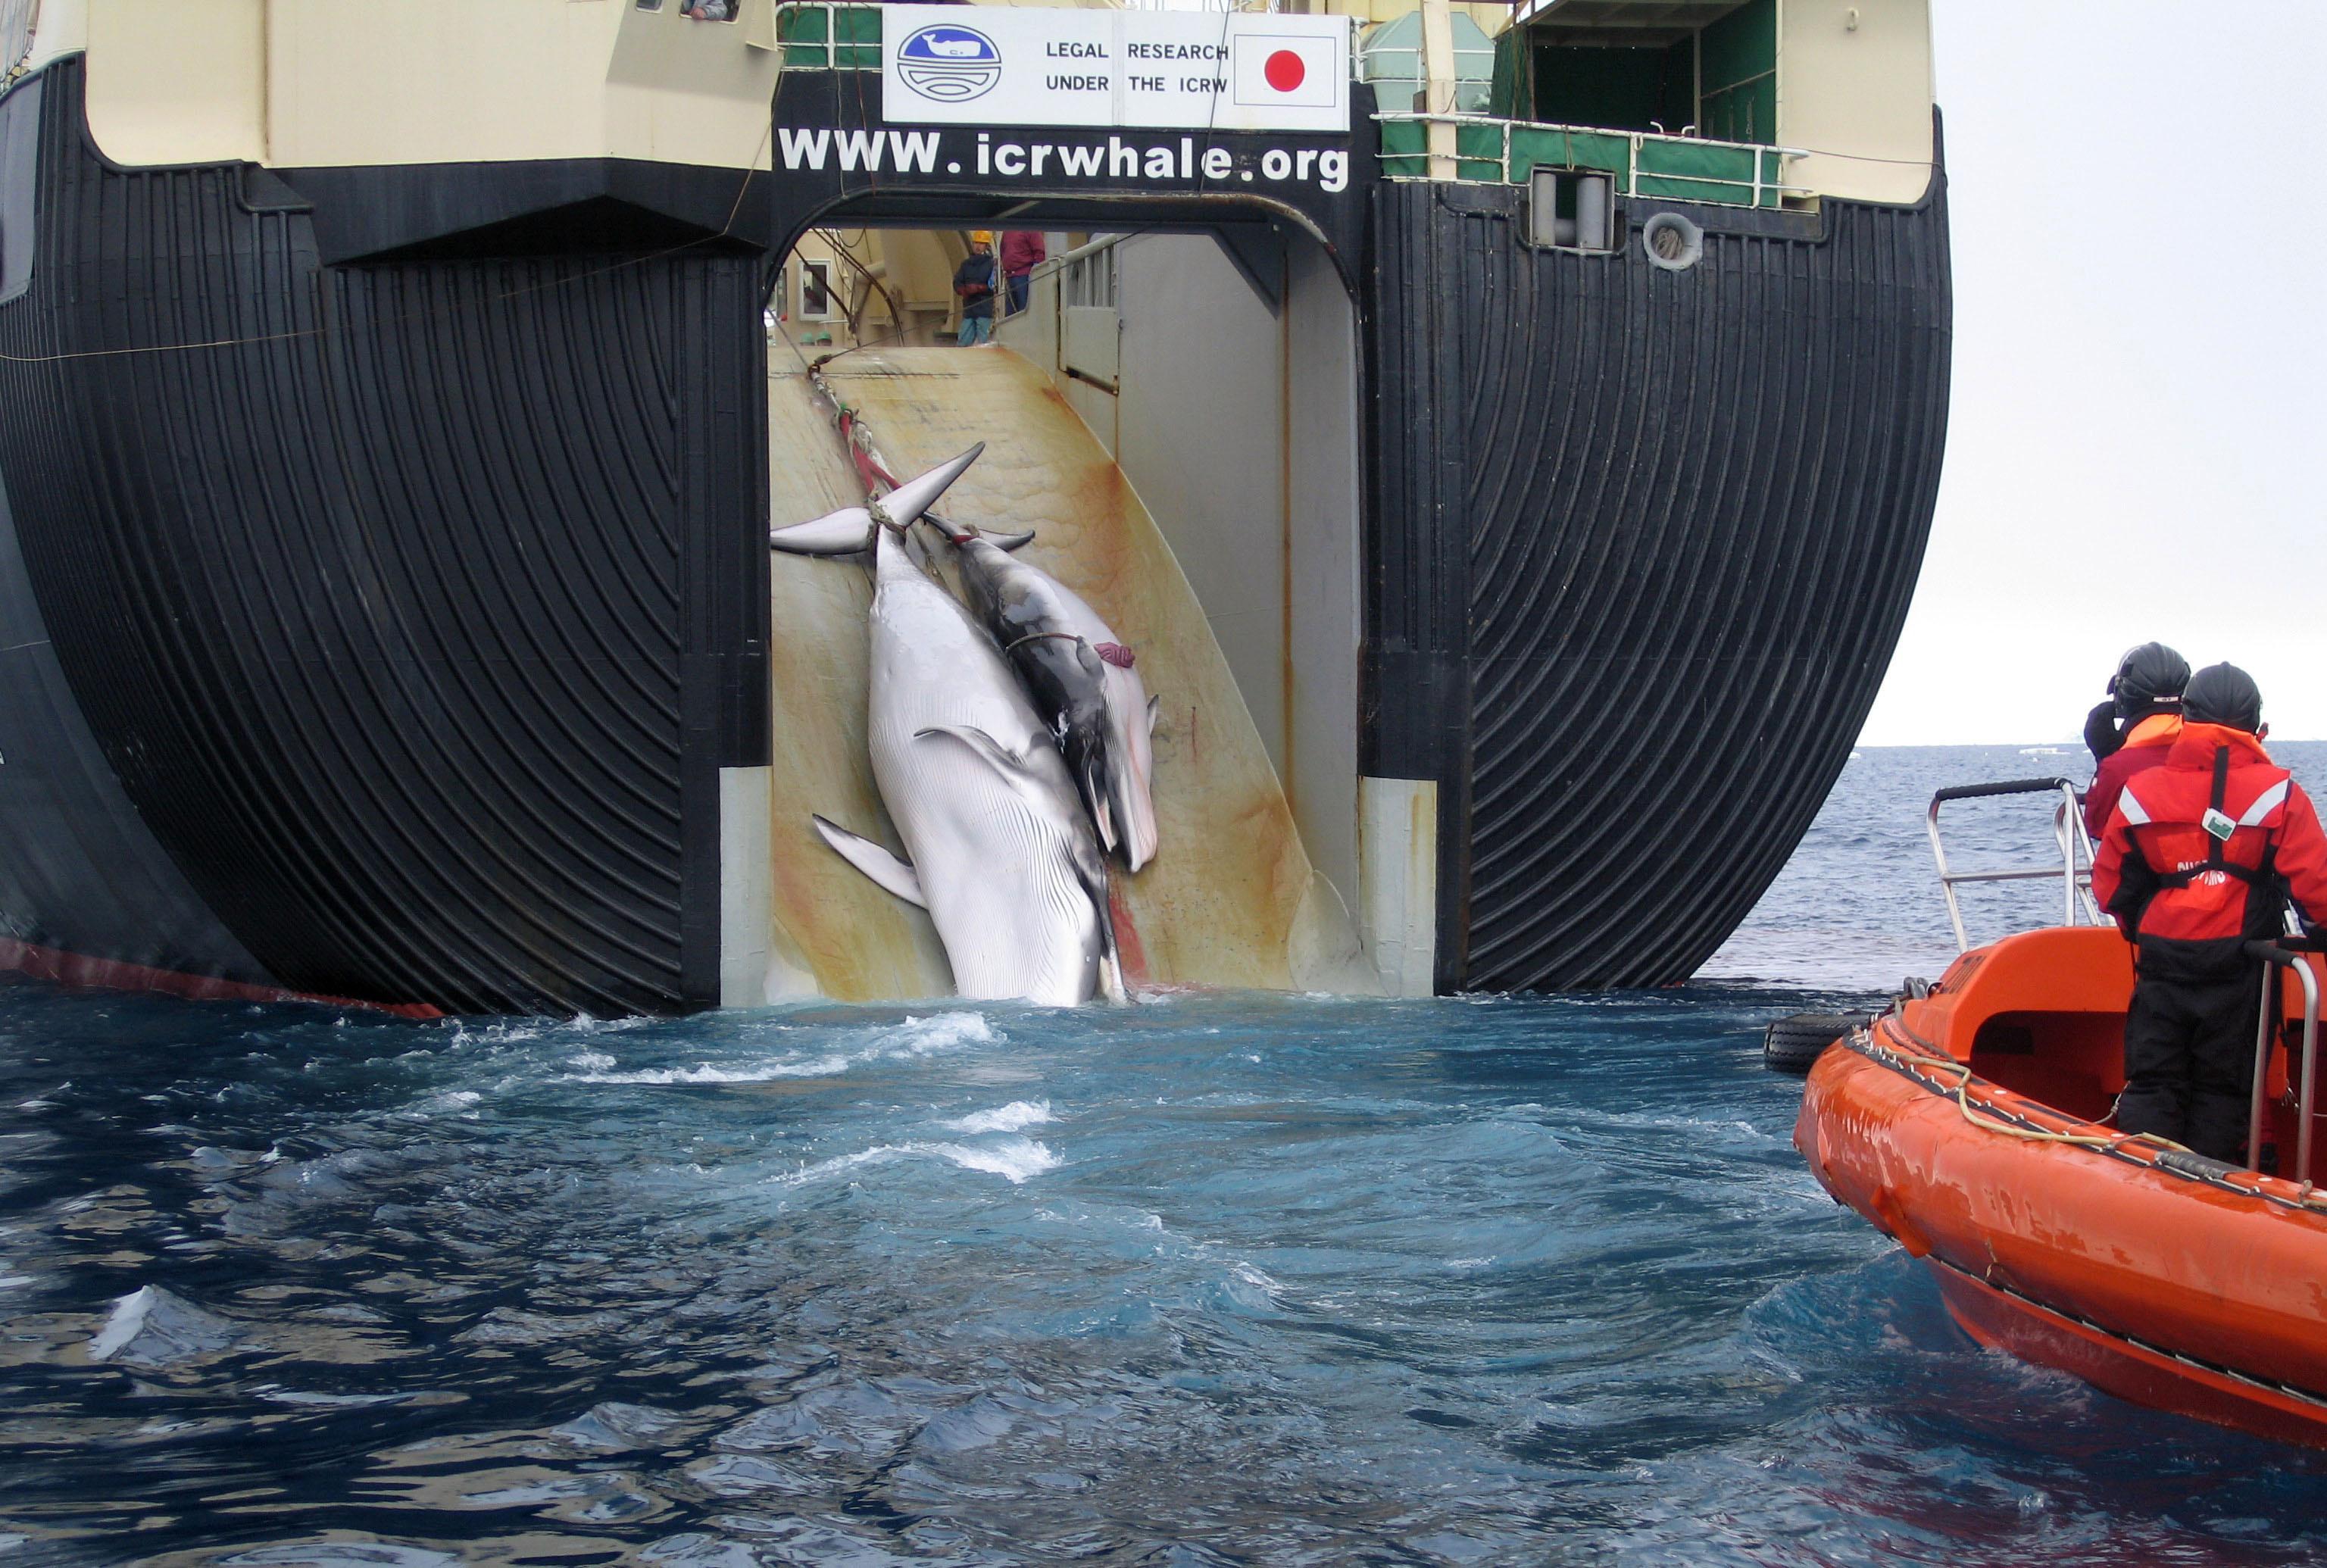 Island provoziert die Internationale Walfang-Kommission